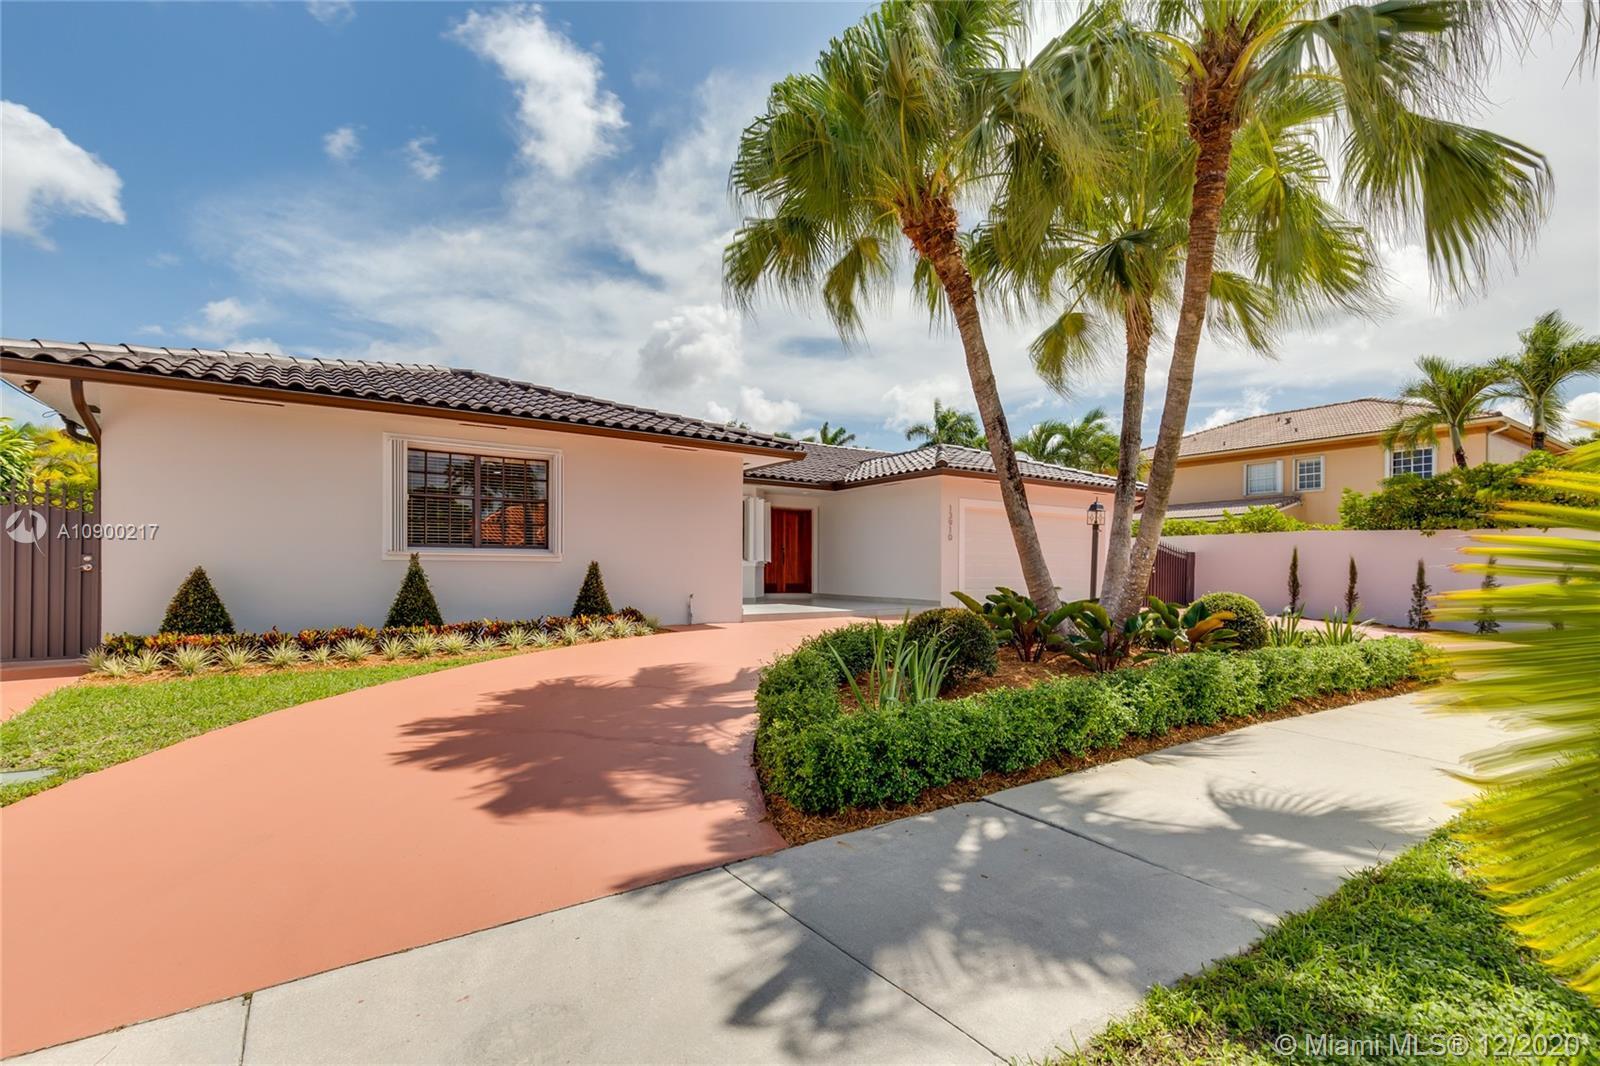 J G Heads Farms - 13910 SW 36th St, Miami, FL 33175